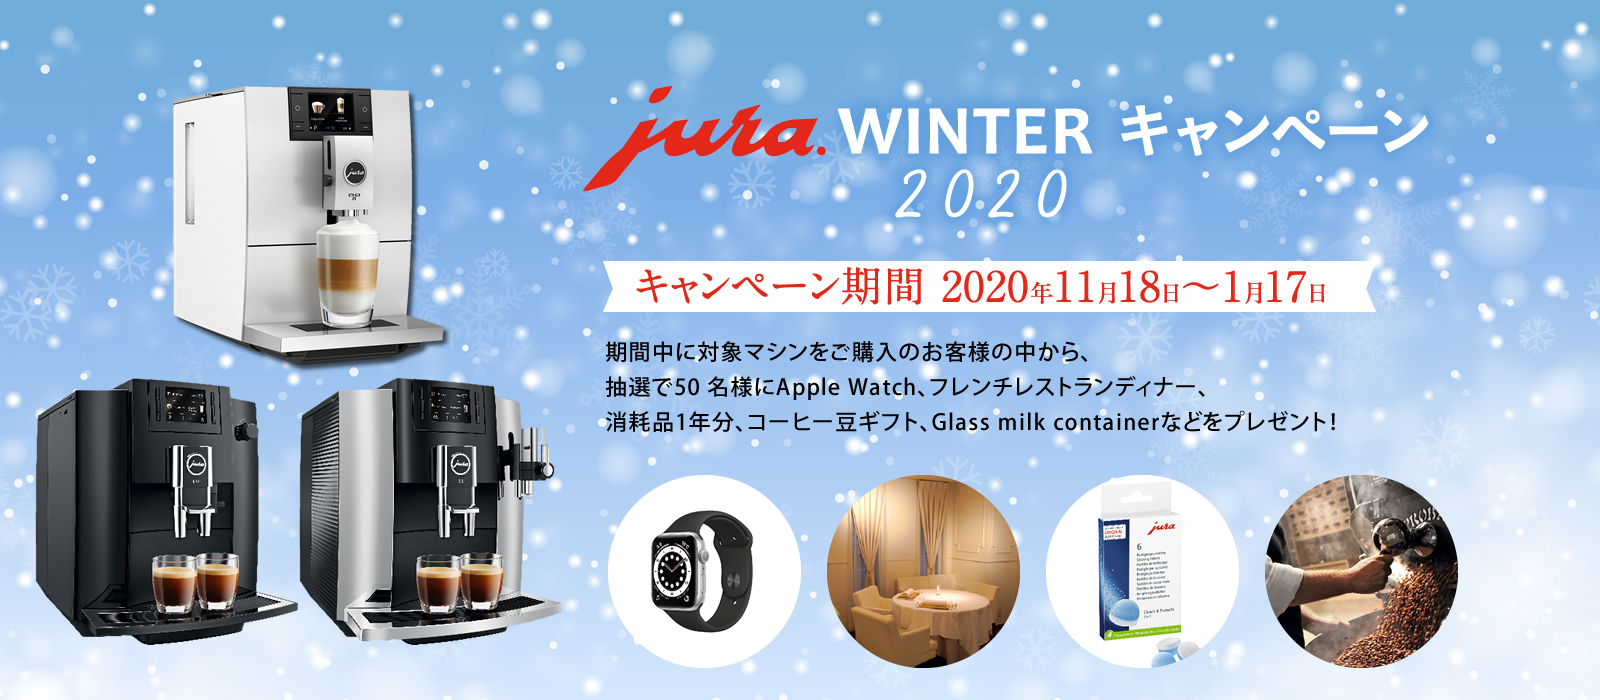 )JURA WINTER キャンペーン 2020